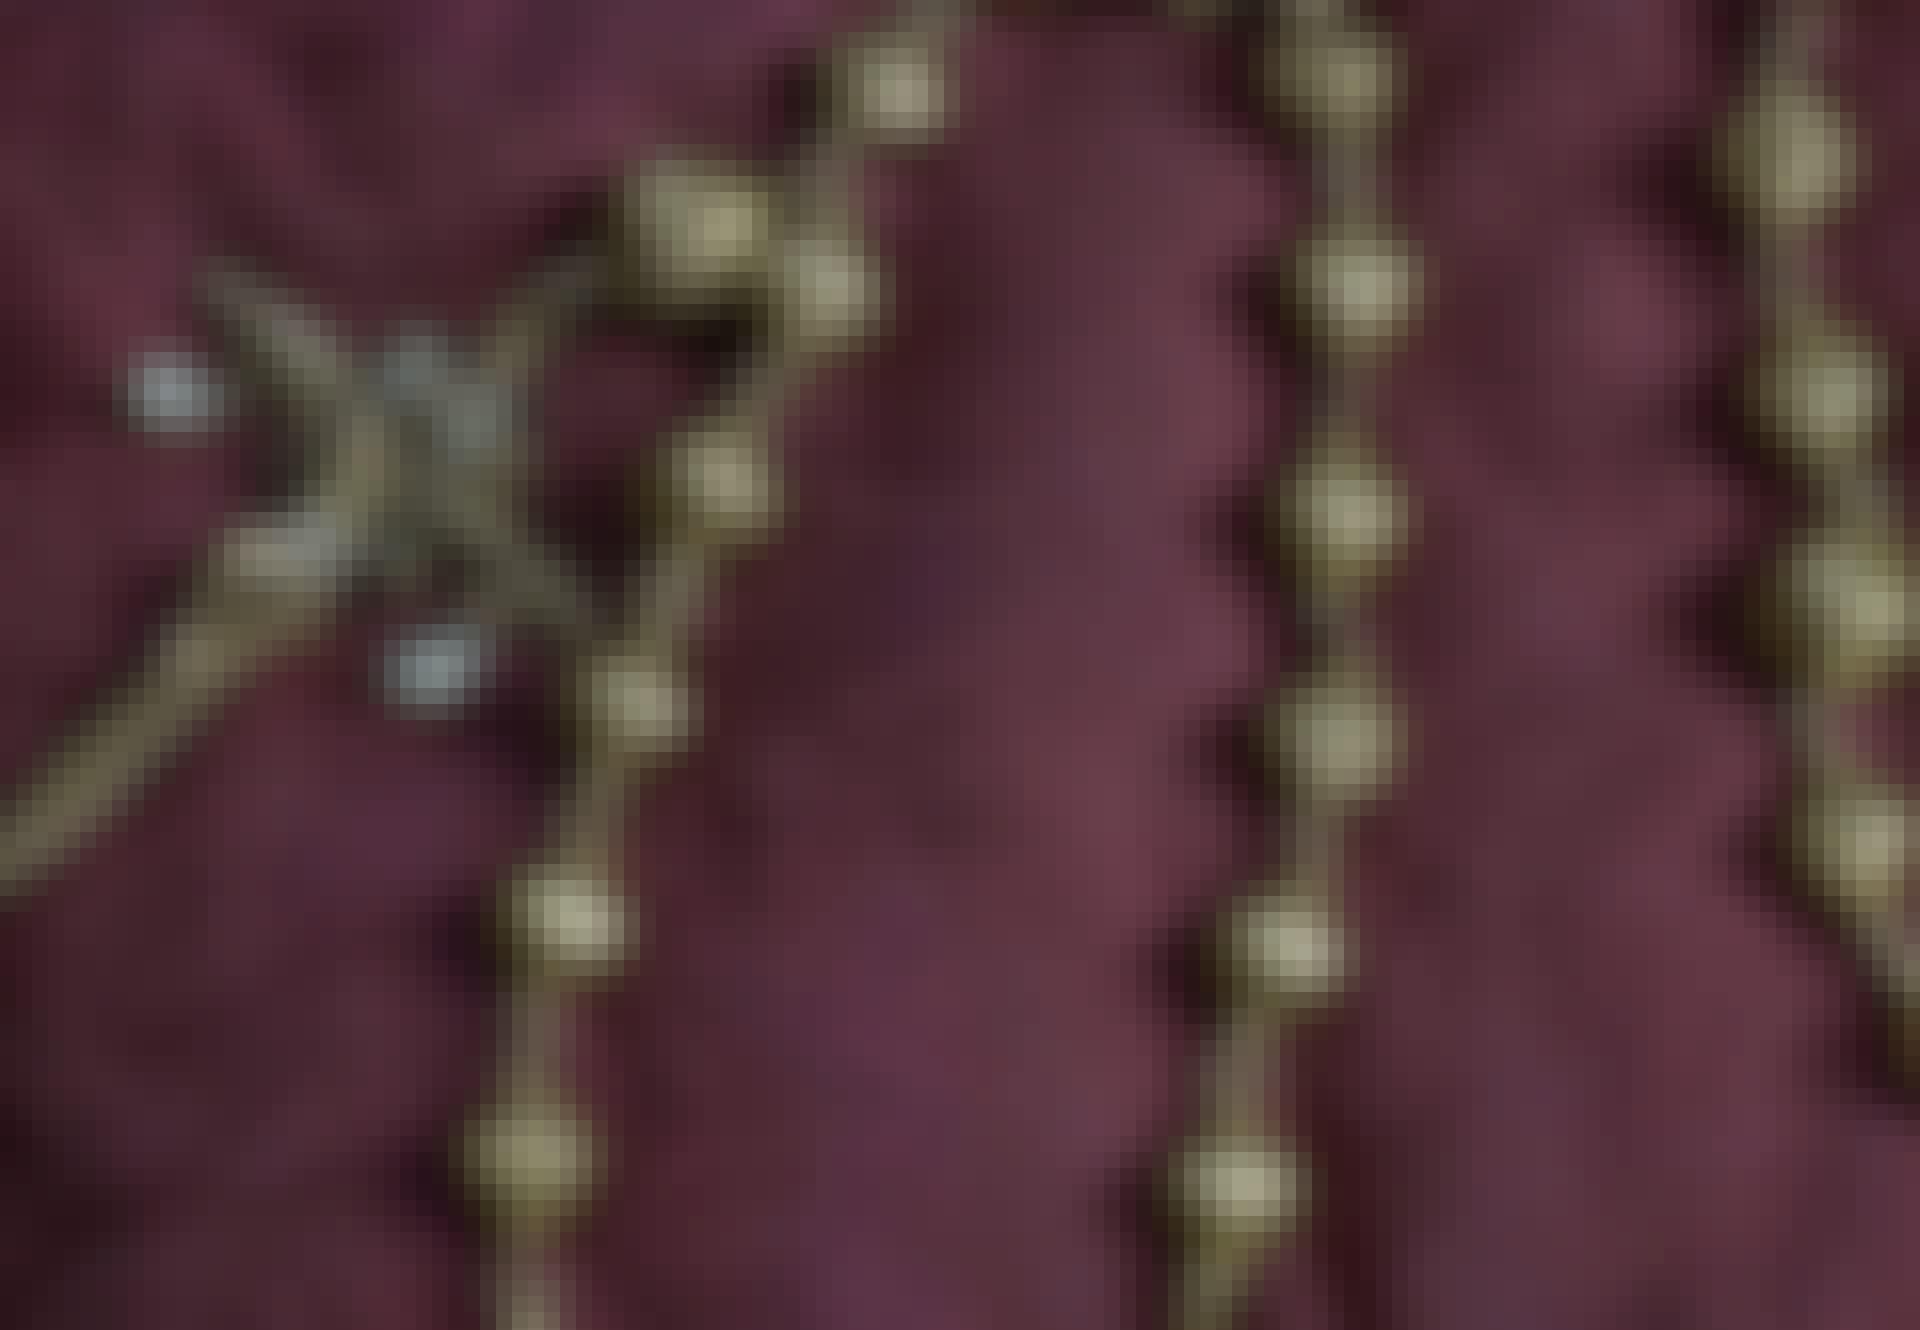 Gouden rozenkrans van koningin Maria